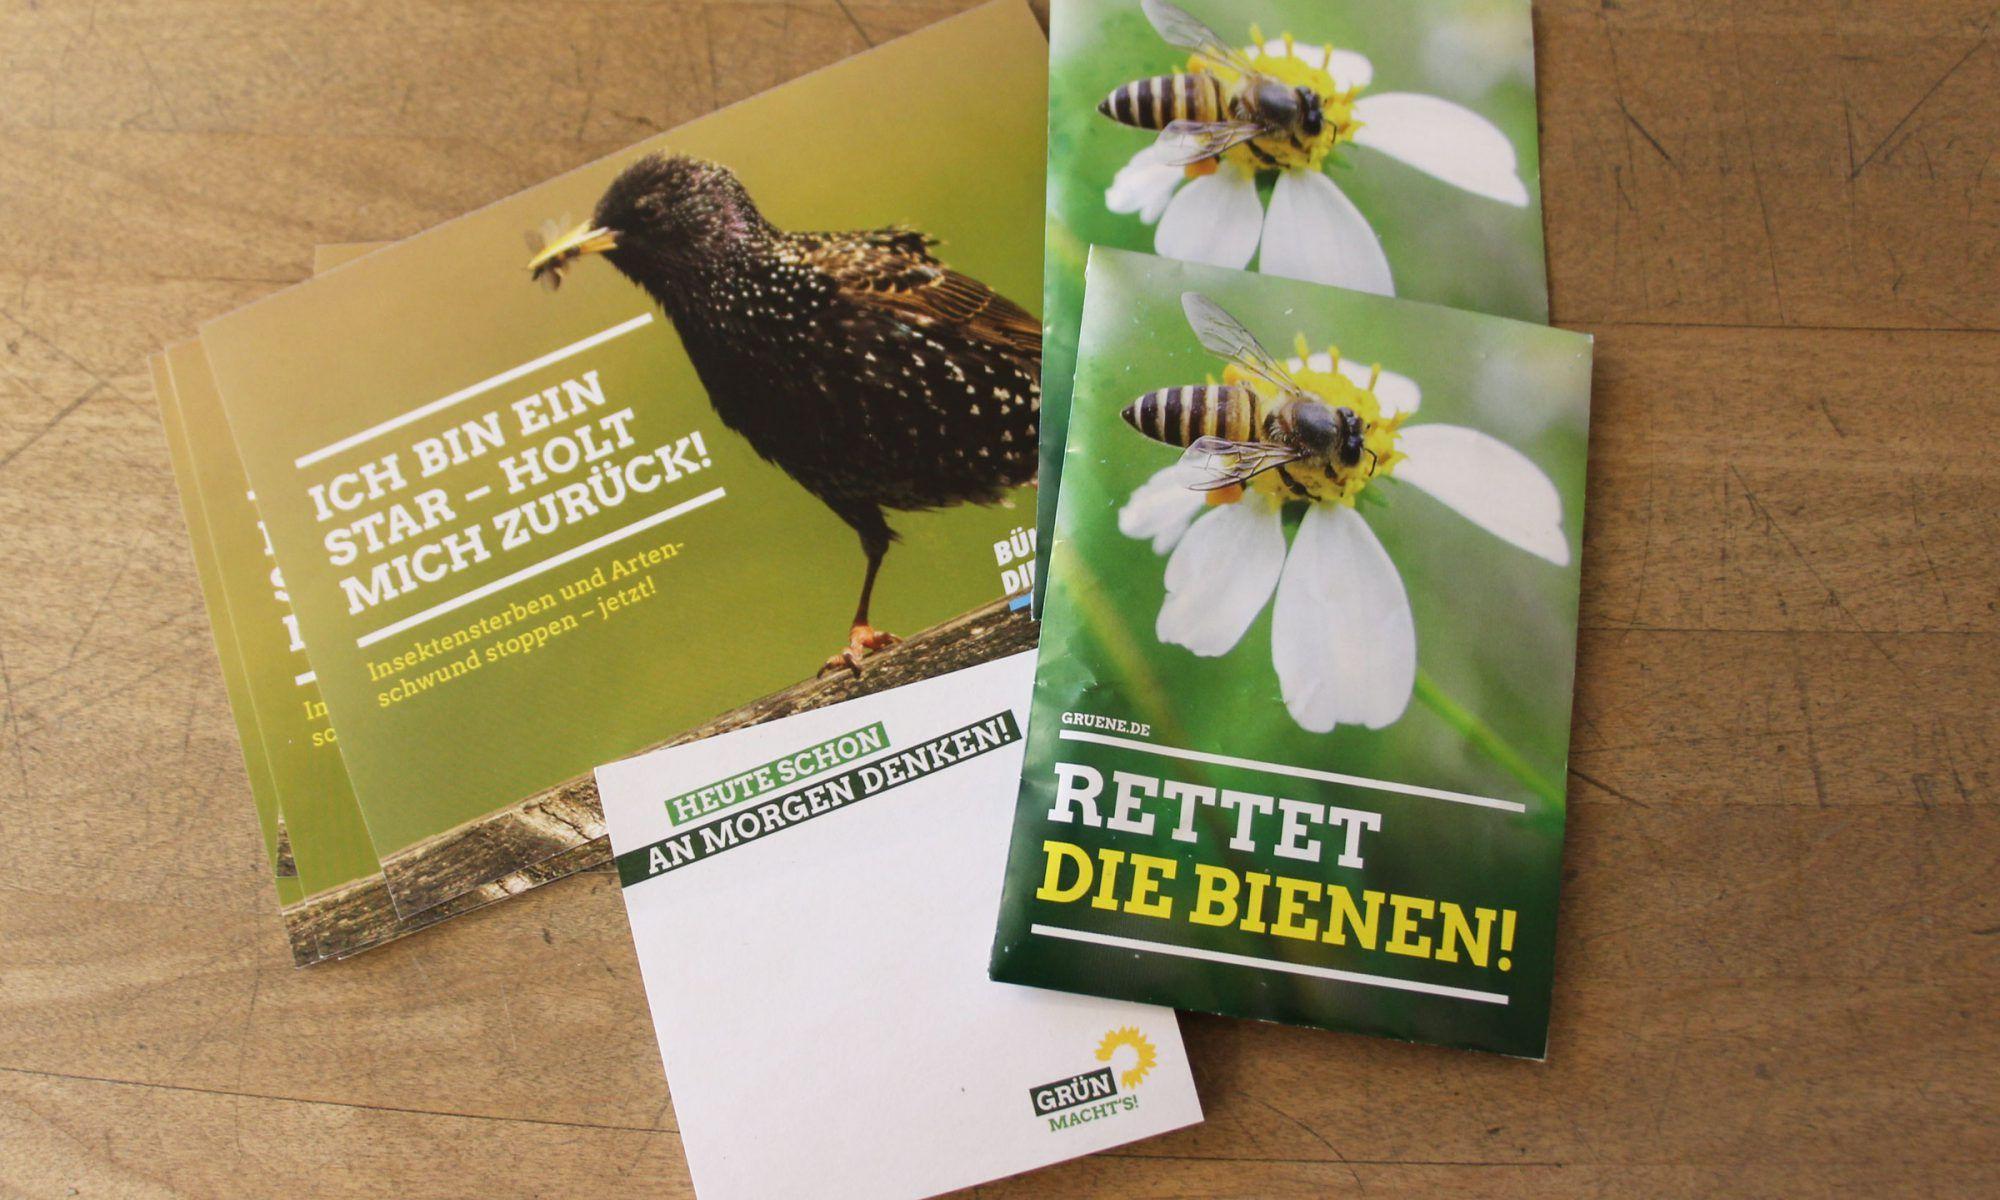 Gratis Paket Samen gegen Insektensterben